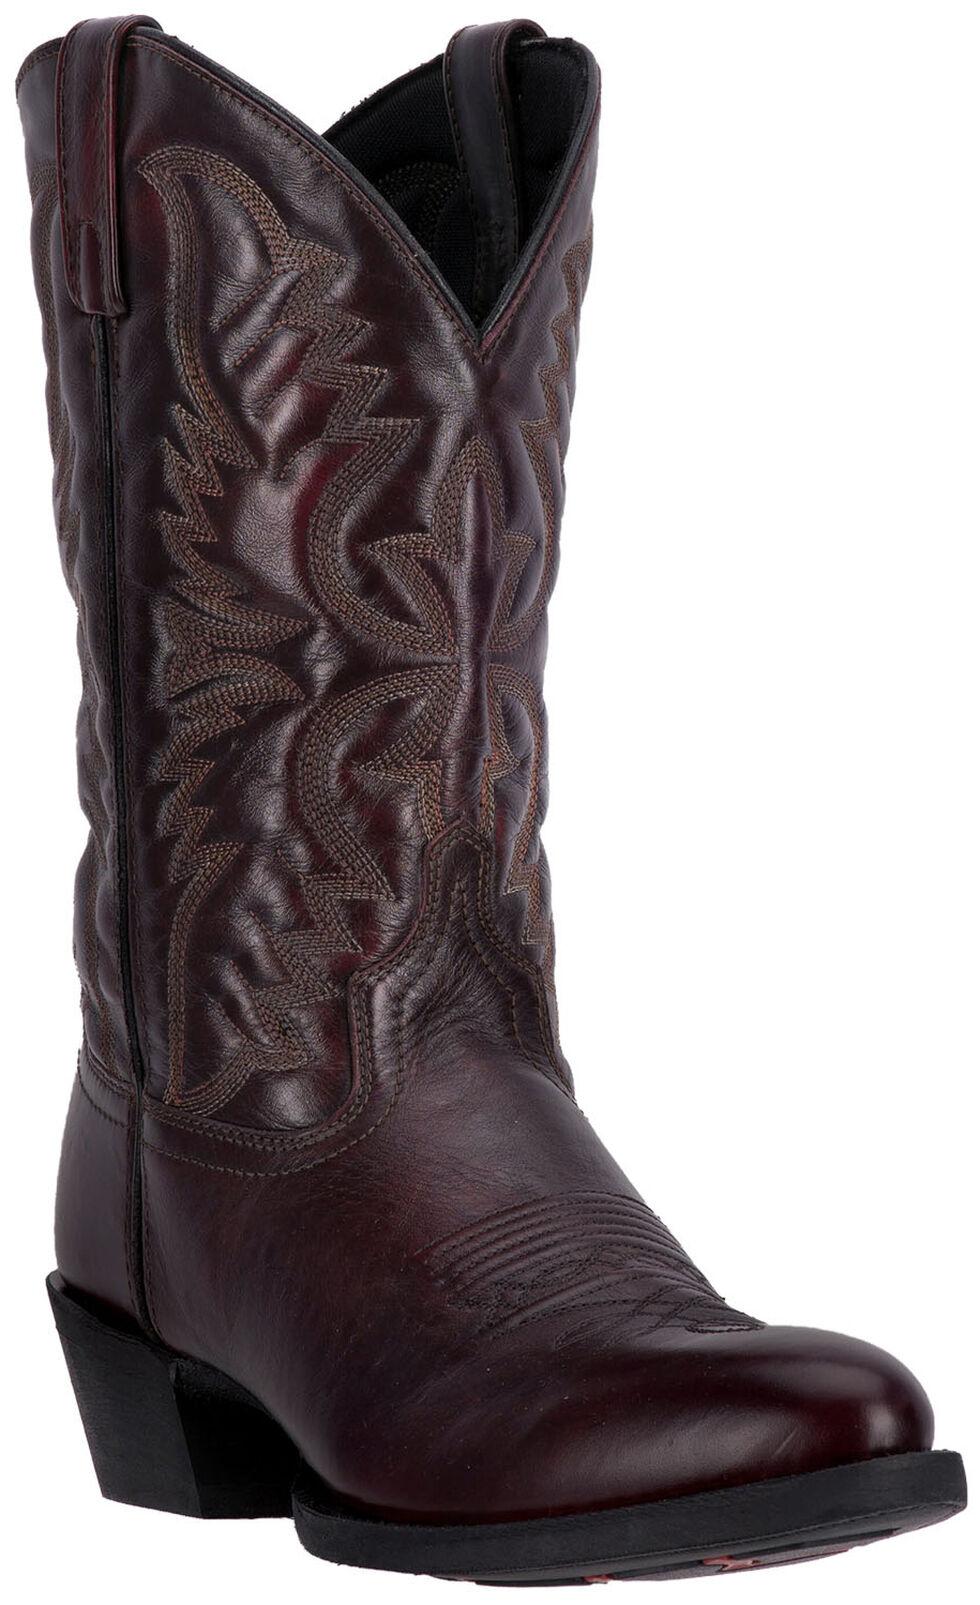 Laredo Birchwood Cowboy Boots - Medium Toe , Black Cherry, hi-res